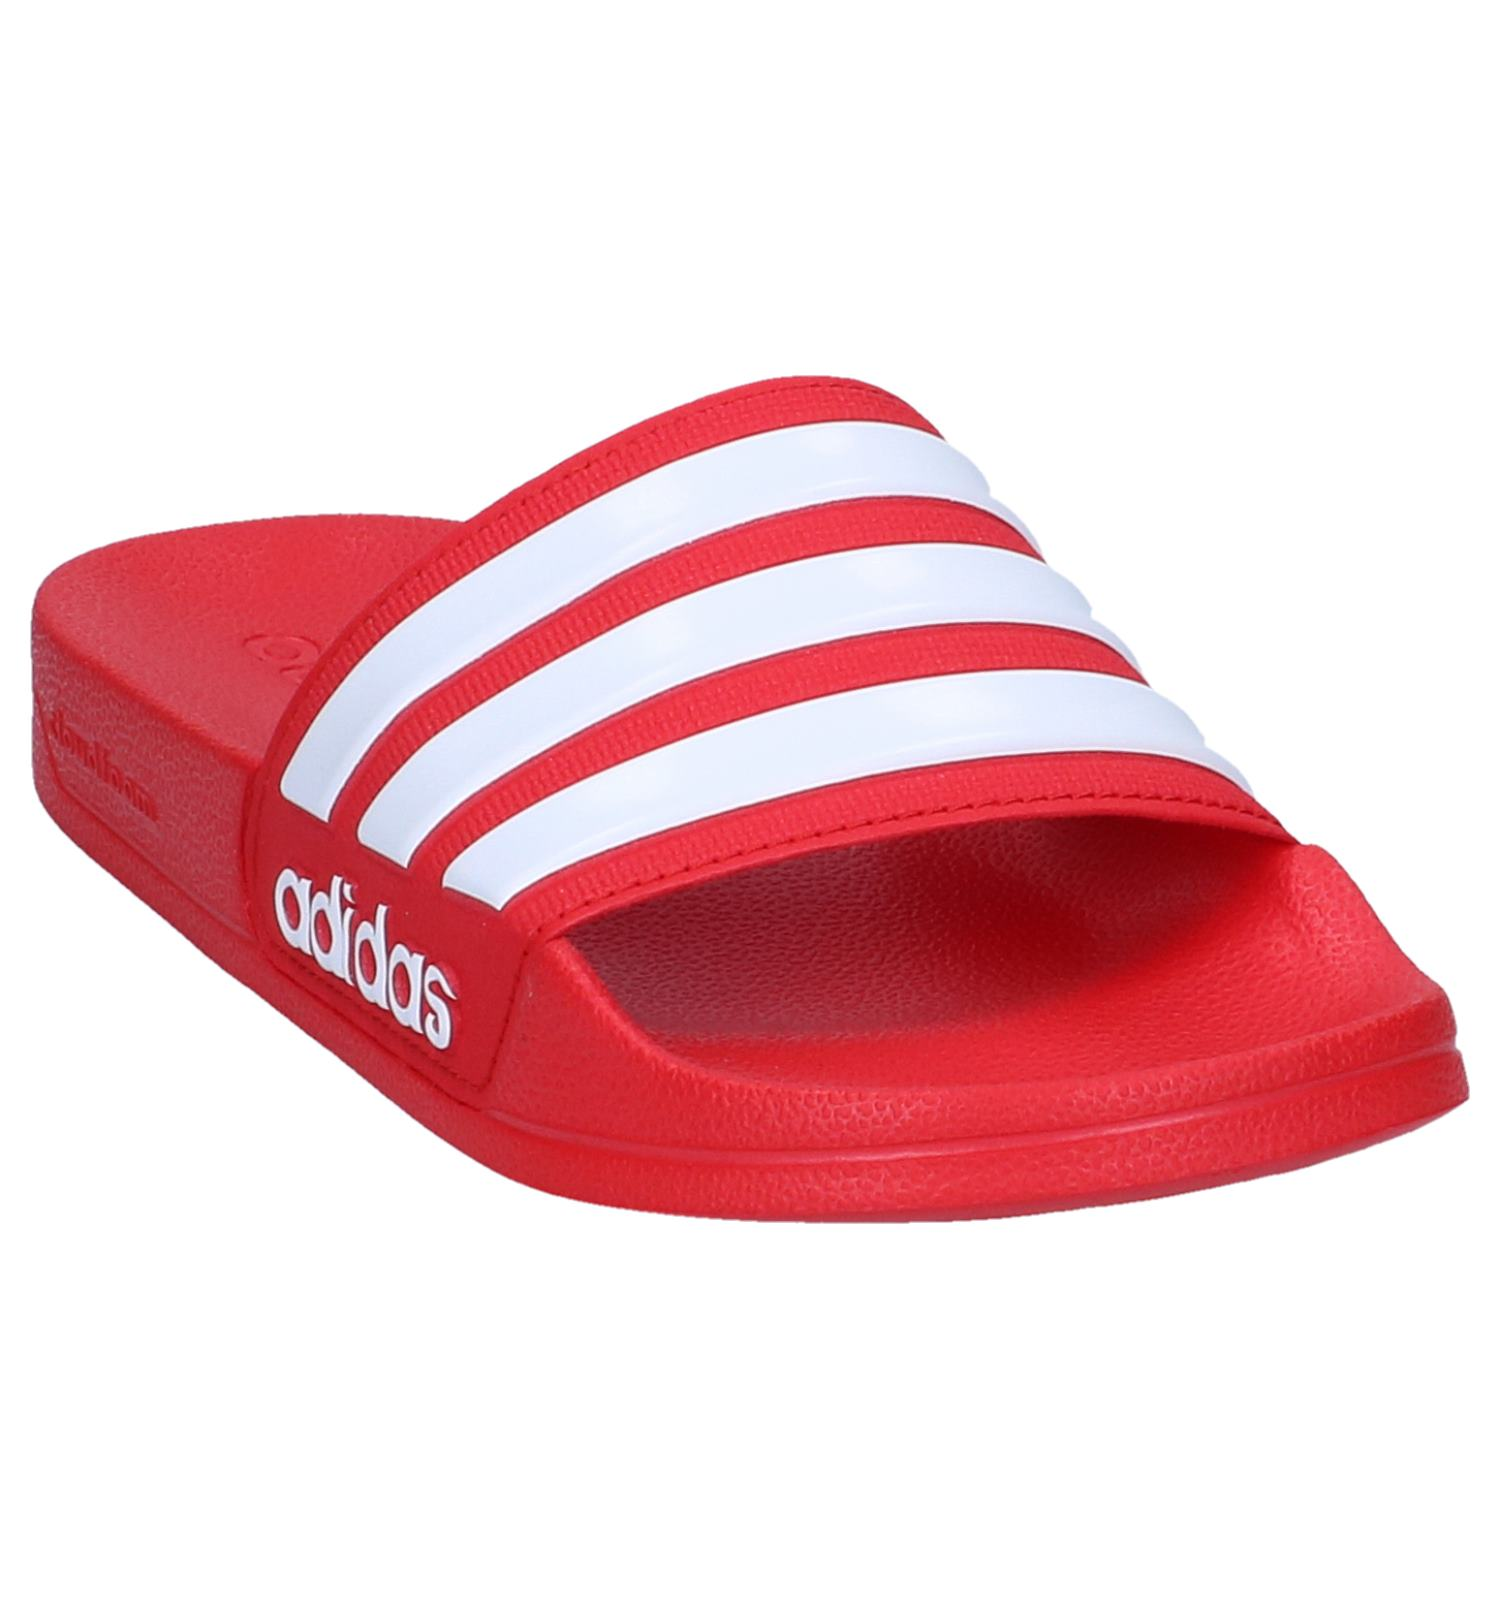 62b86502e03 Rode Slippers adidas Adilette Cloudfoam | TORFS.BE | Gratis verzend en  retour